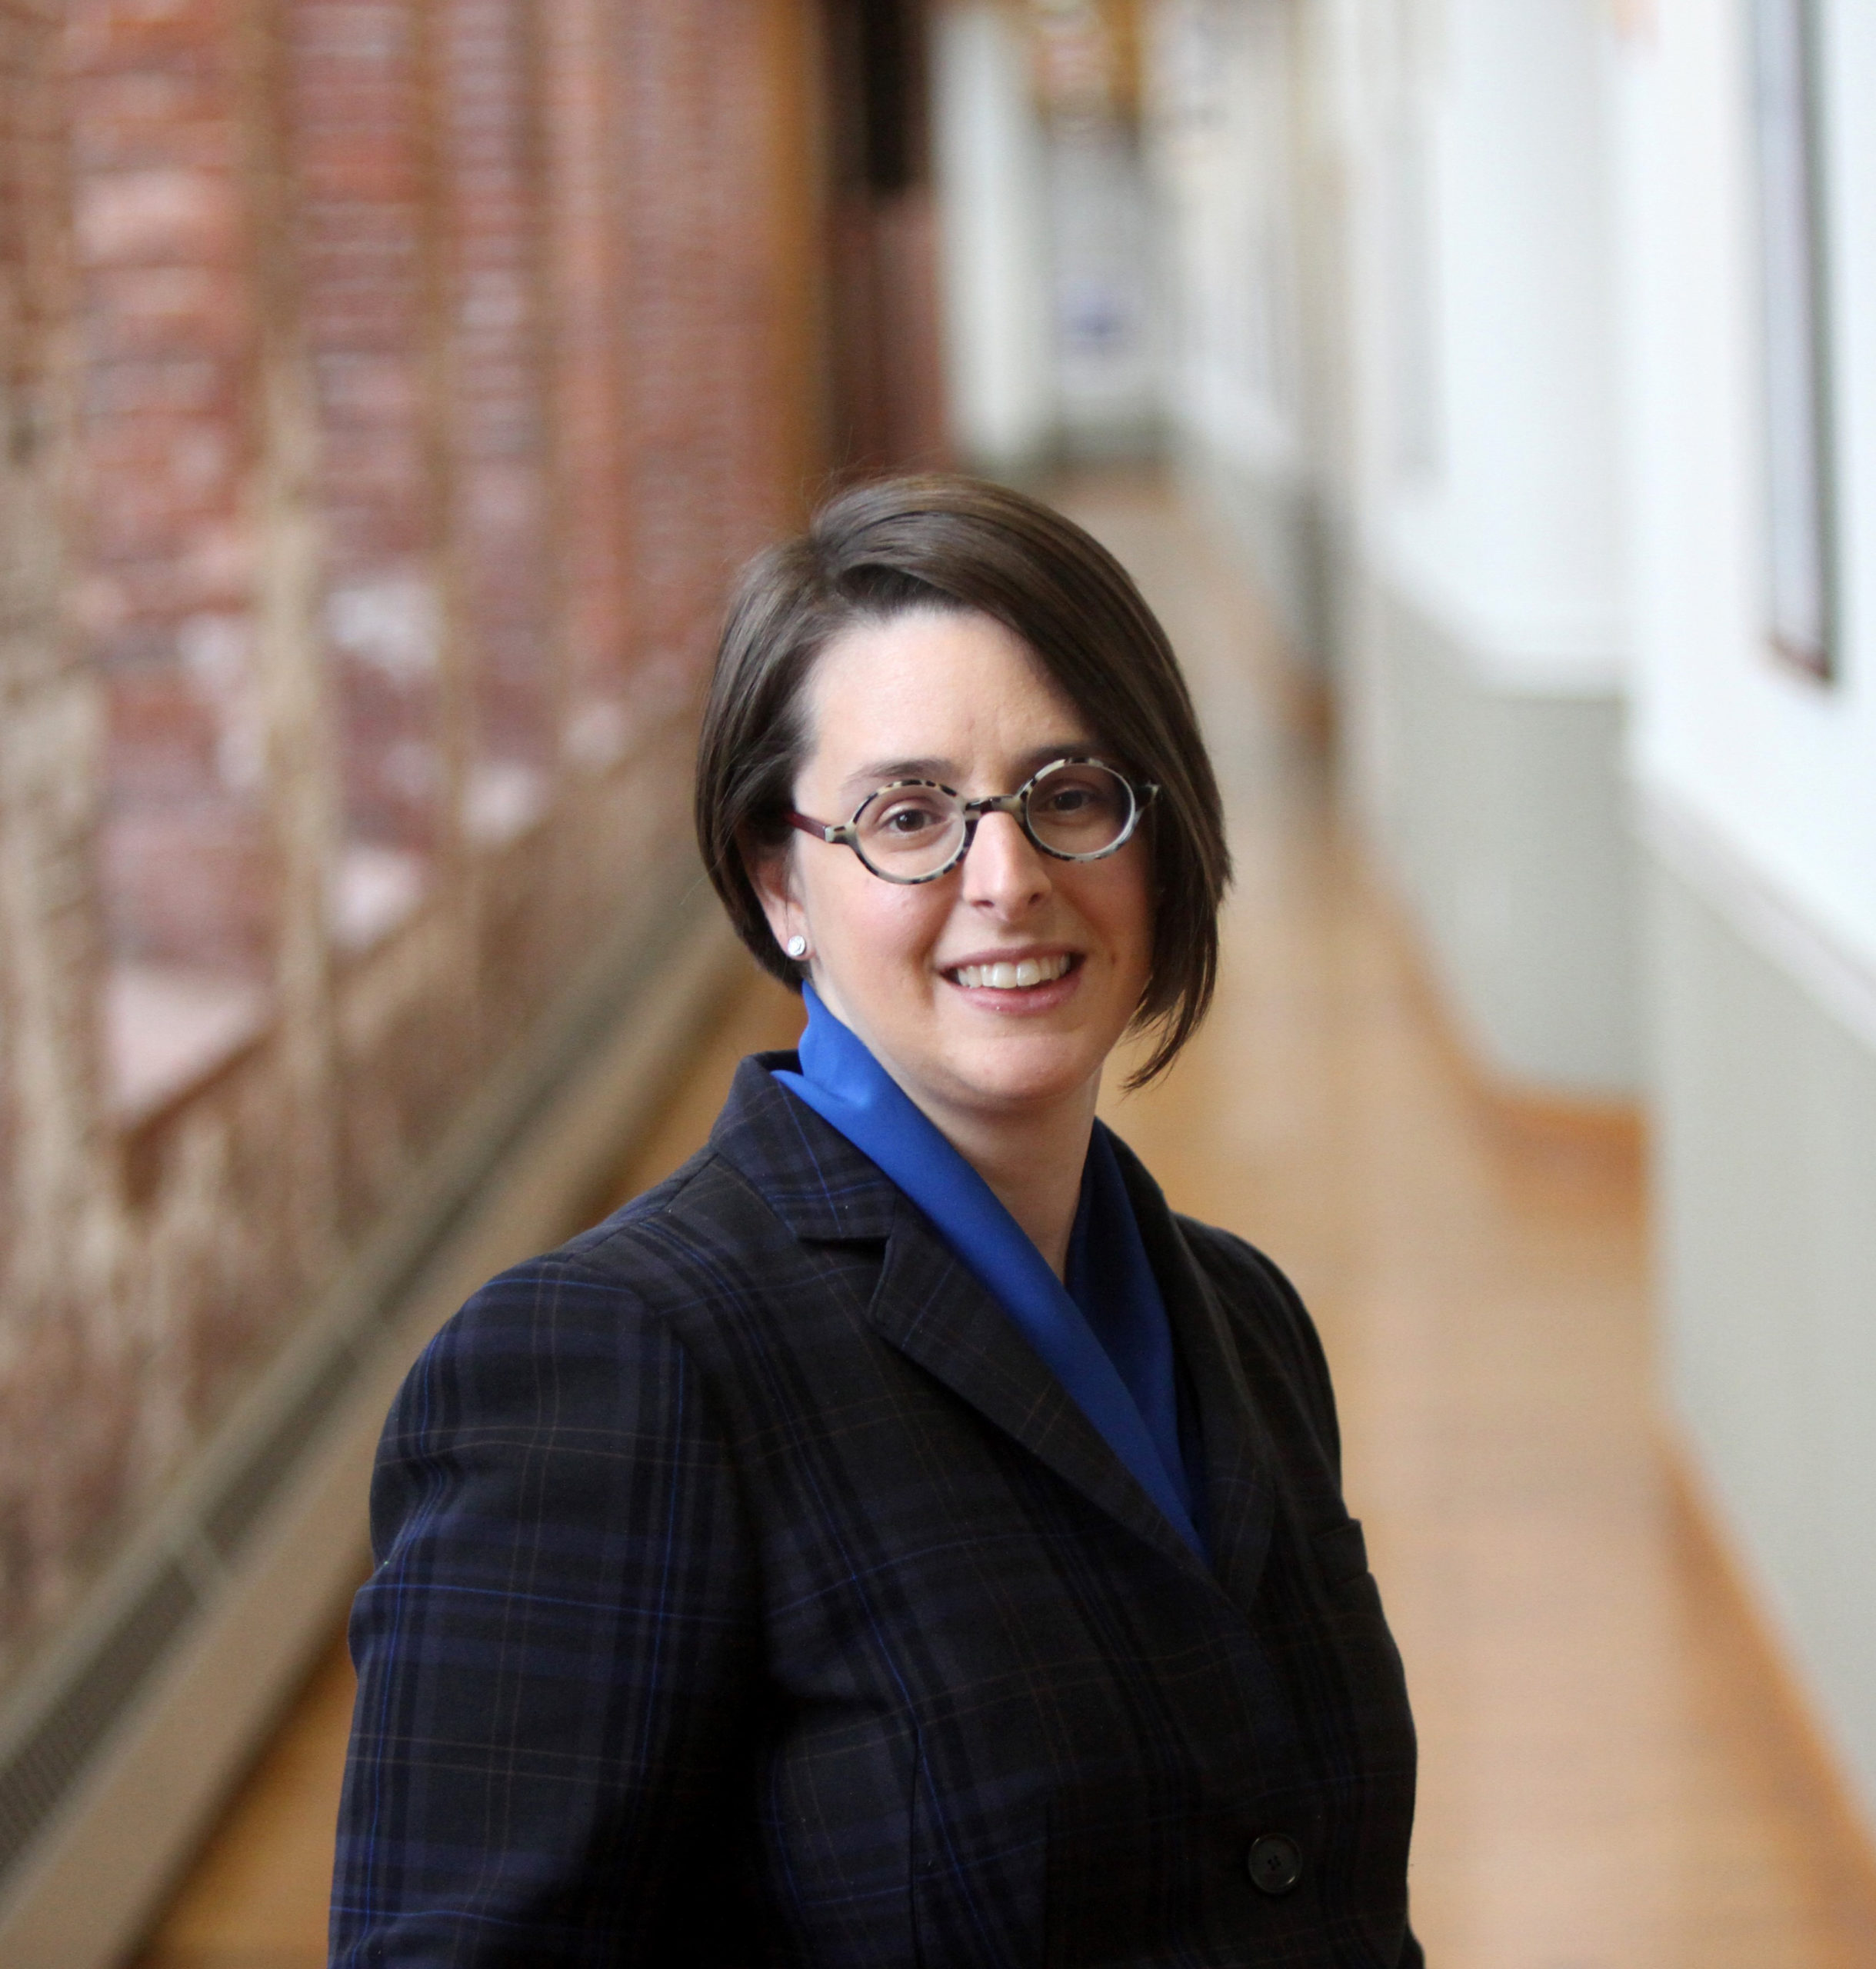 Attorney Christina Ferrari